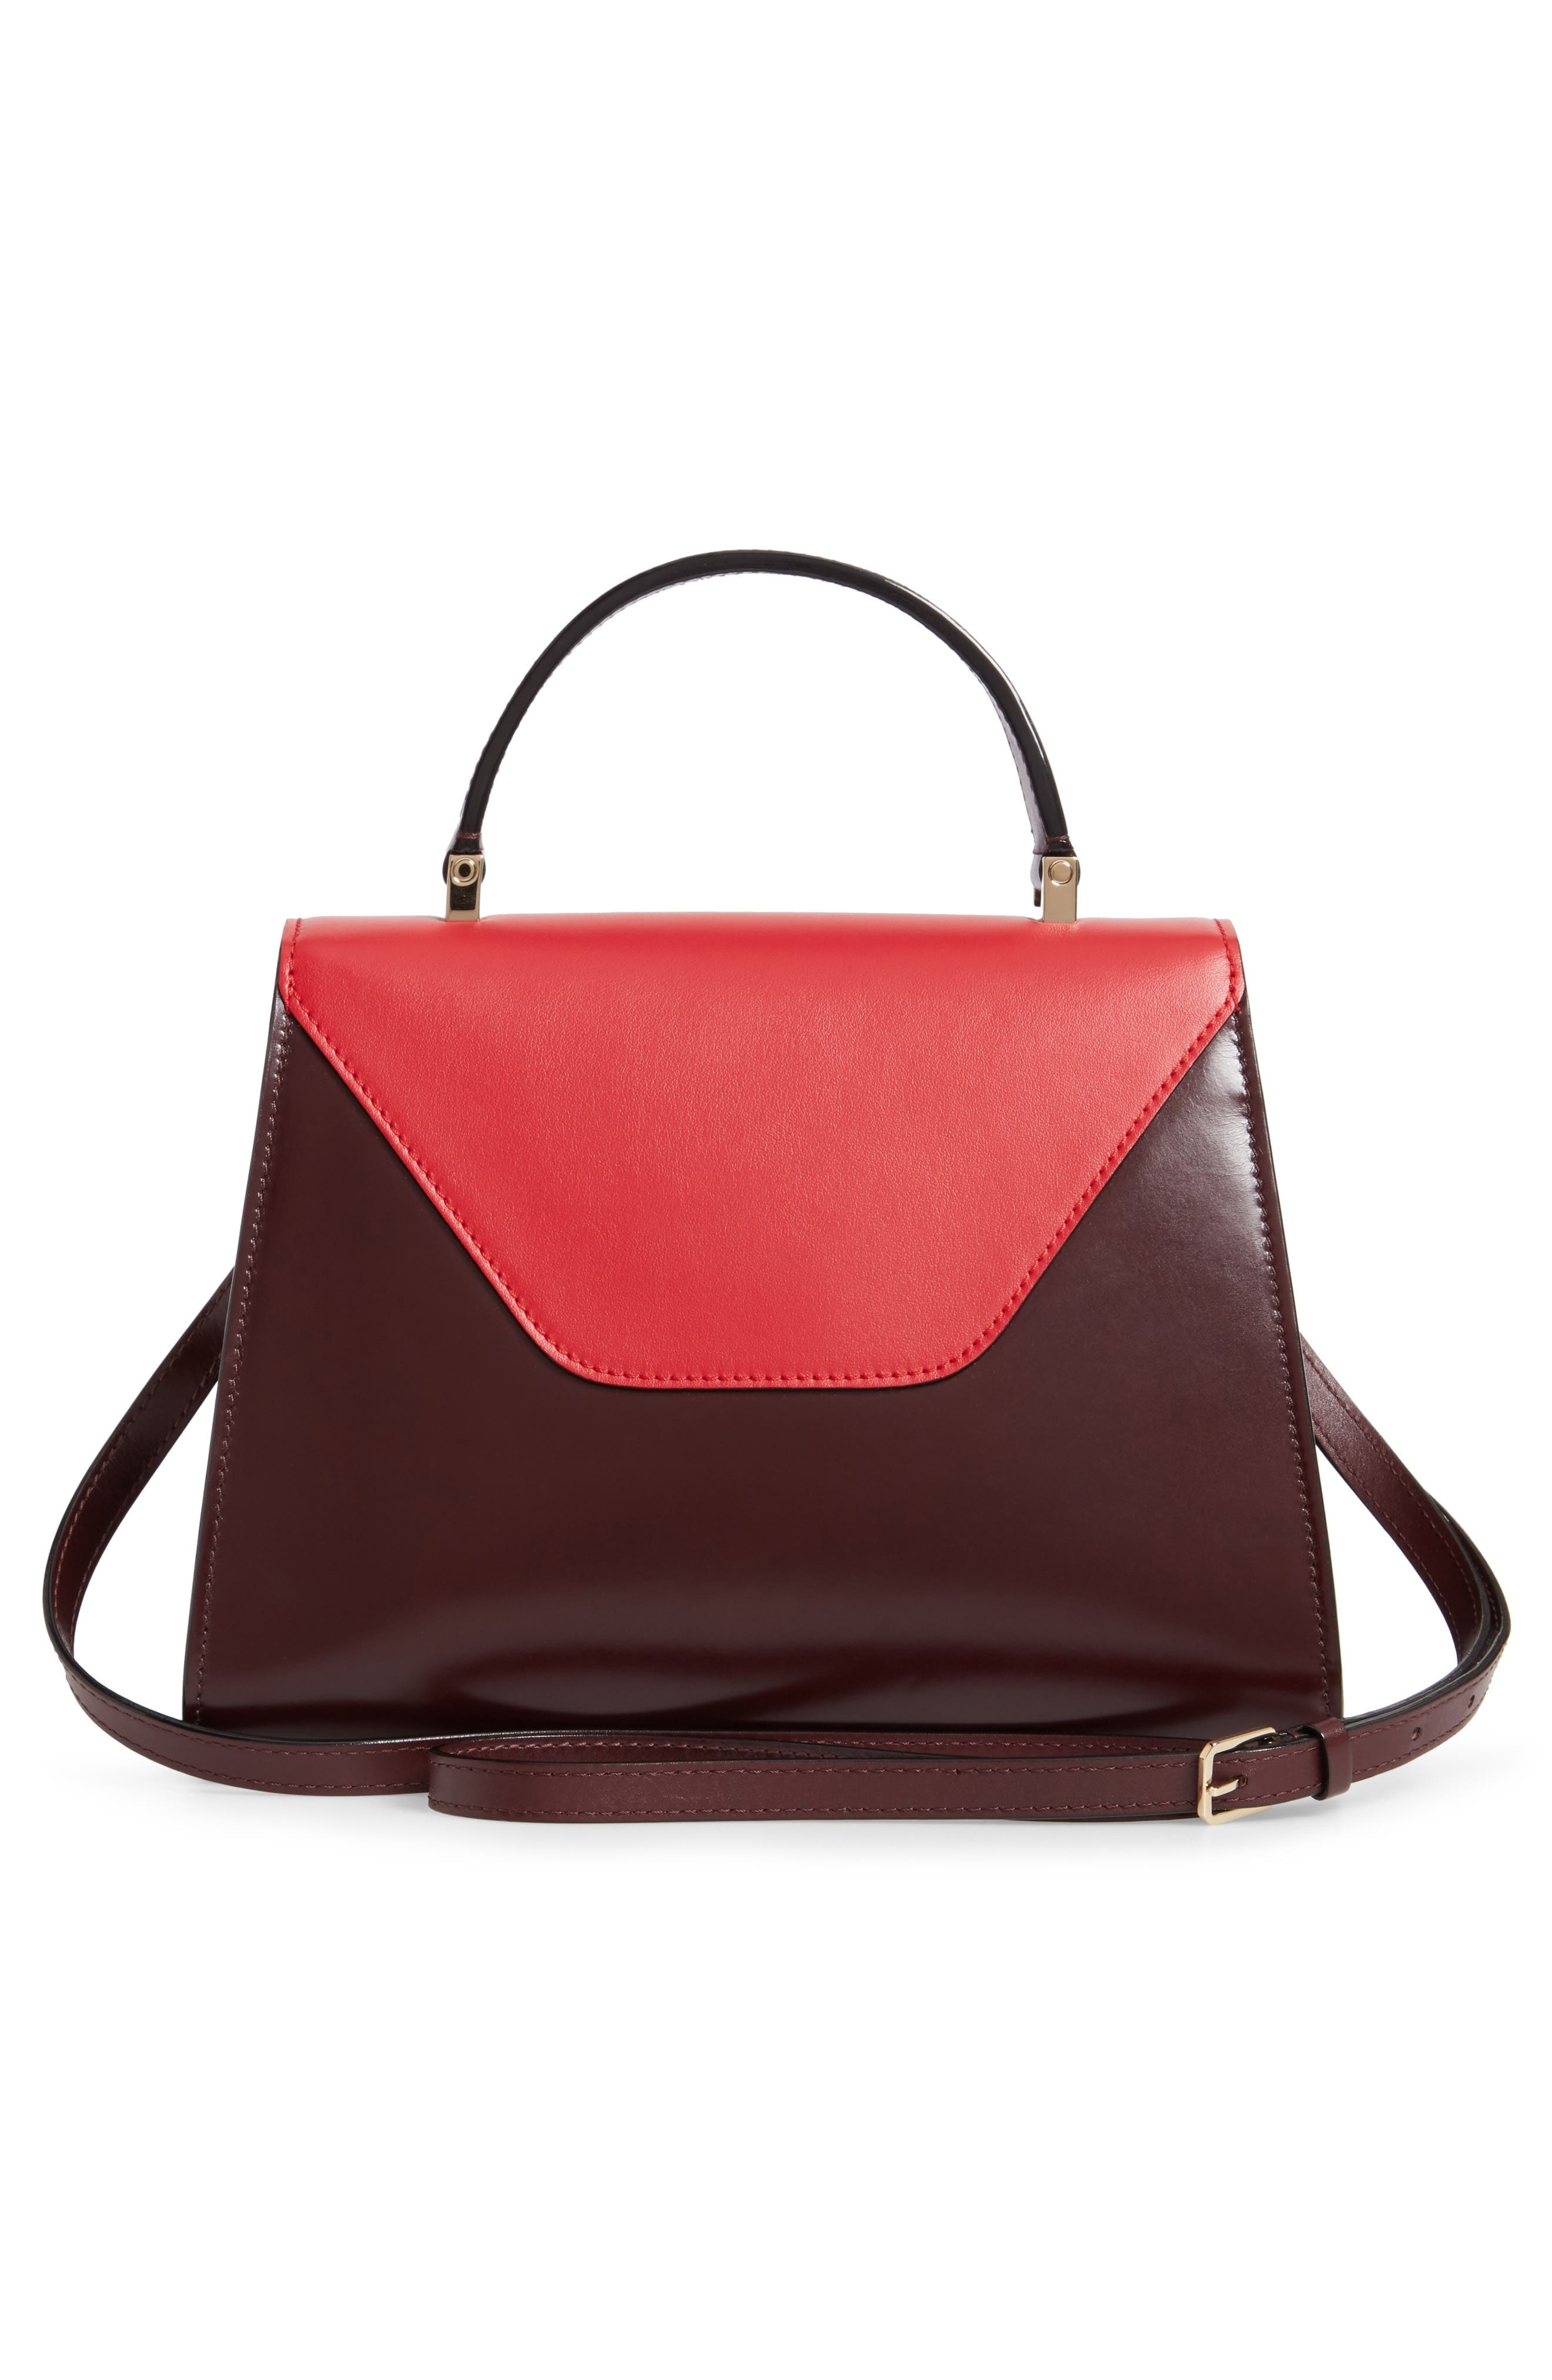 Iside Medium Colorblock Leather Top Handle Bag,                             Alternate thumbnail 3, color,                             FRAGOLA/ GRANATA